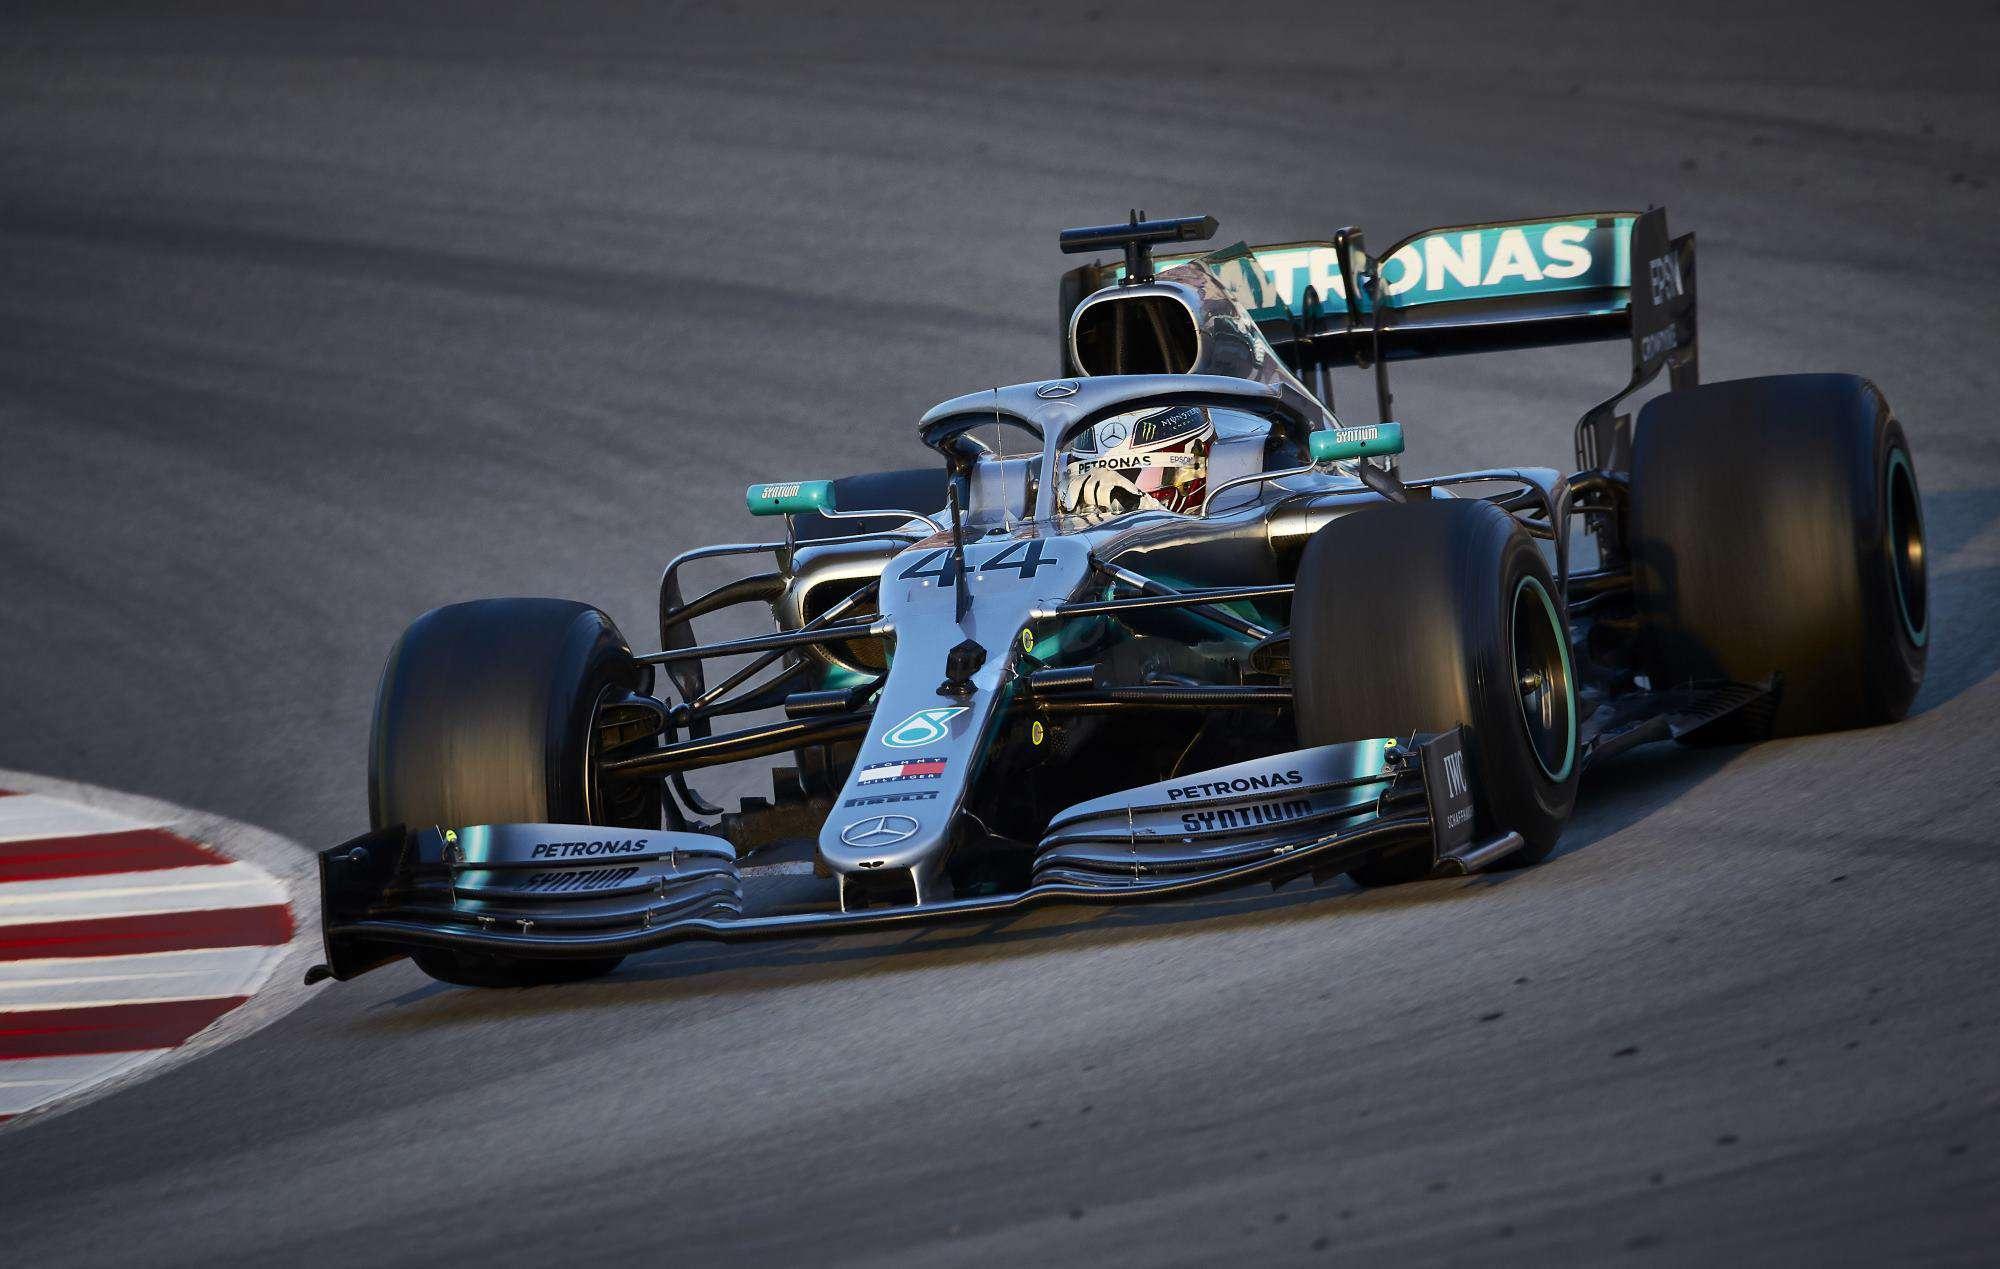 Lewis Hamilton Mercedes W10 Barcelona test 1 Day 3 corner Photo Daimler